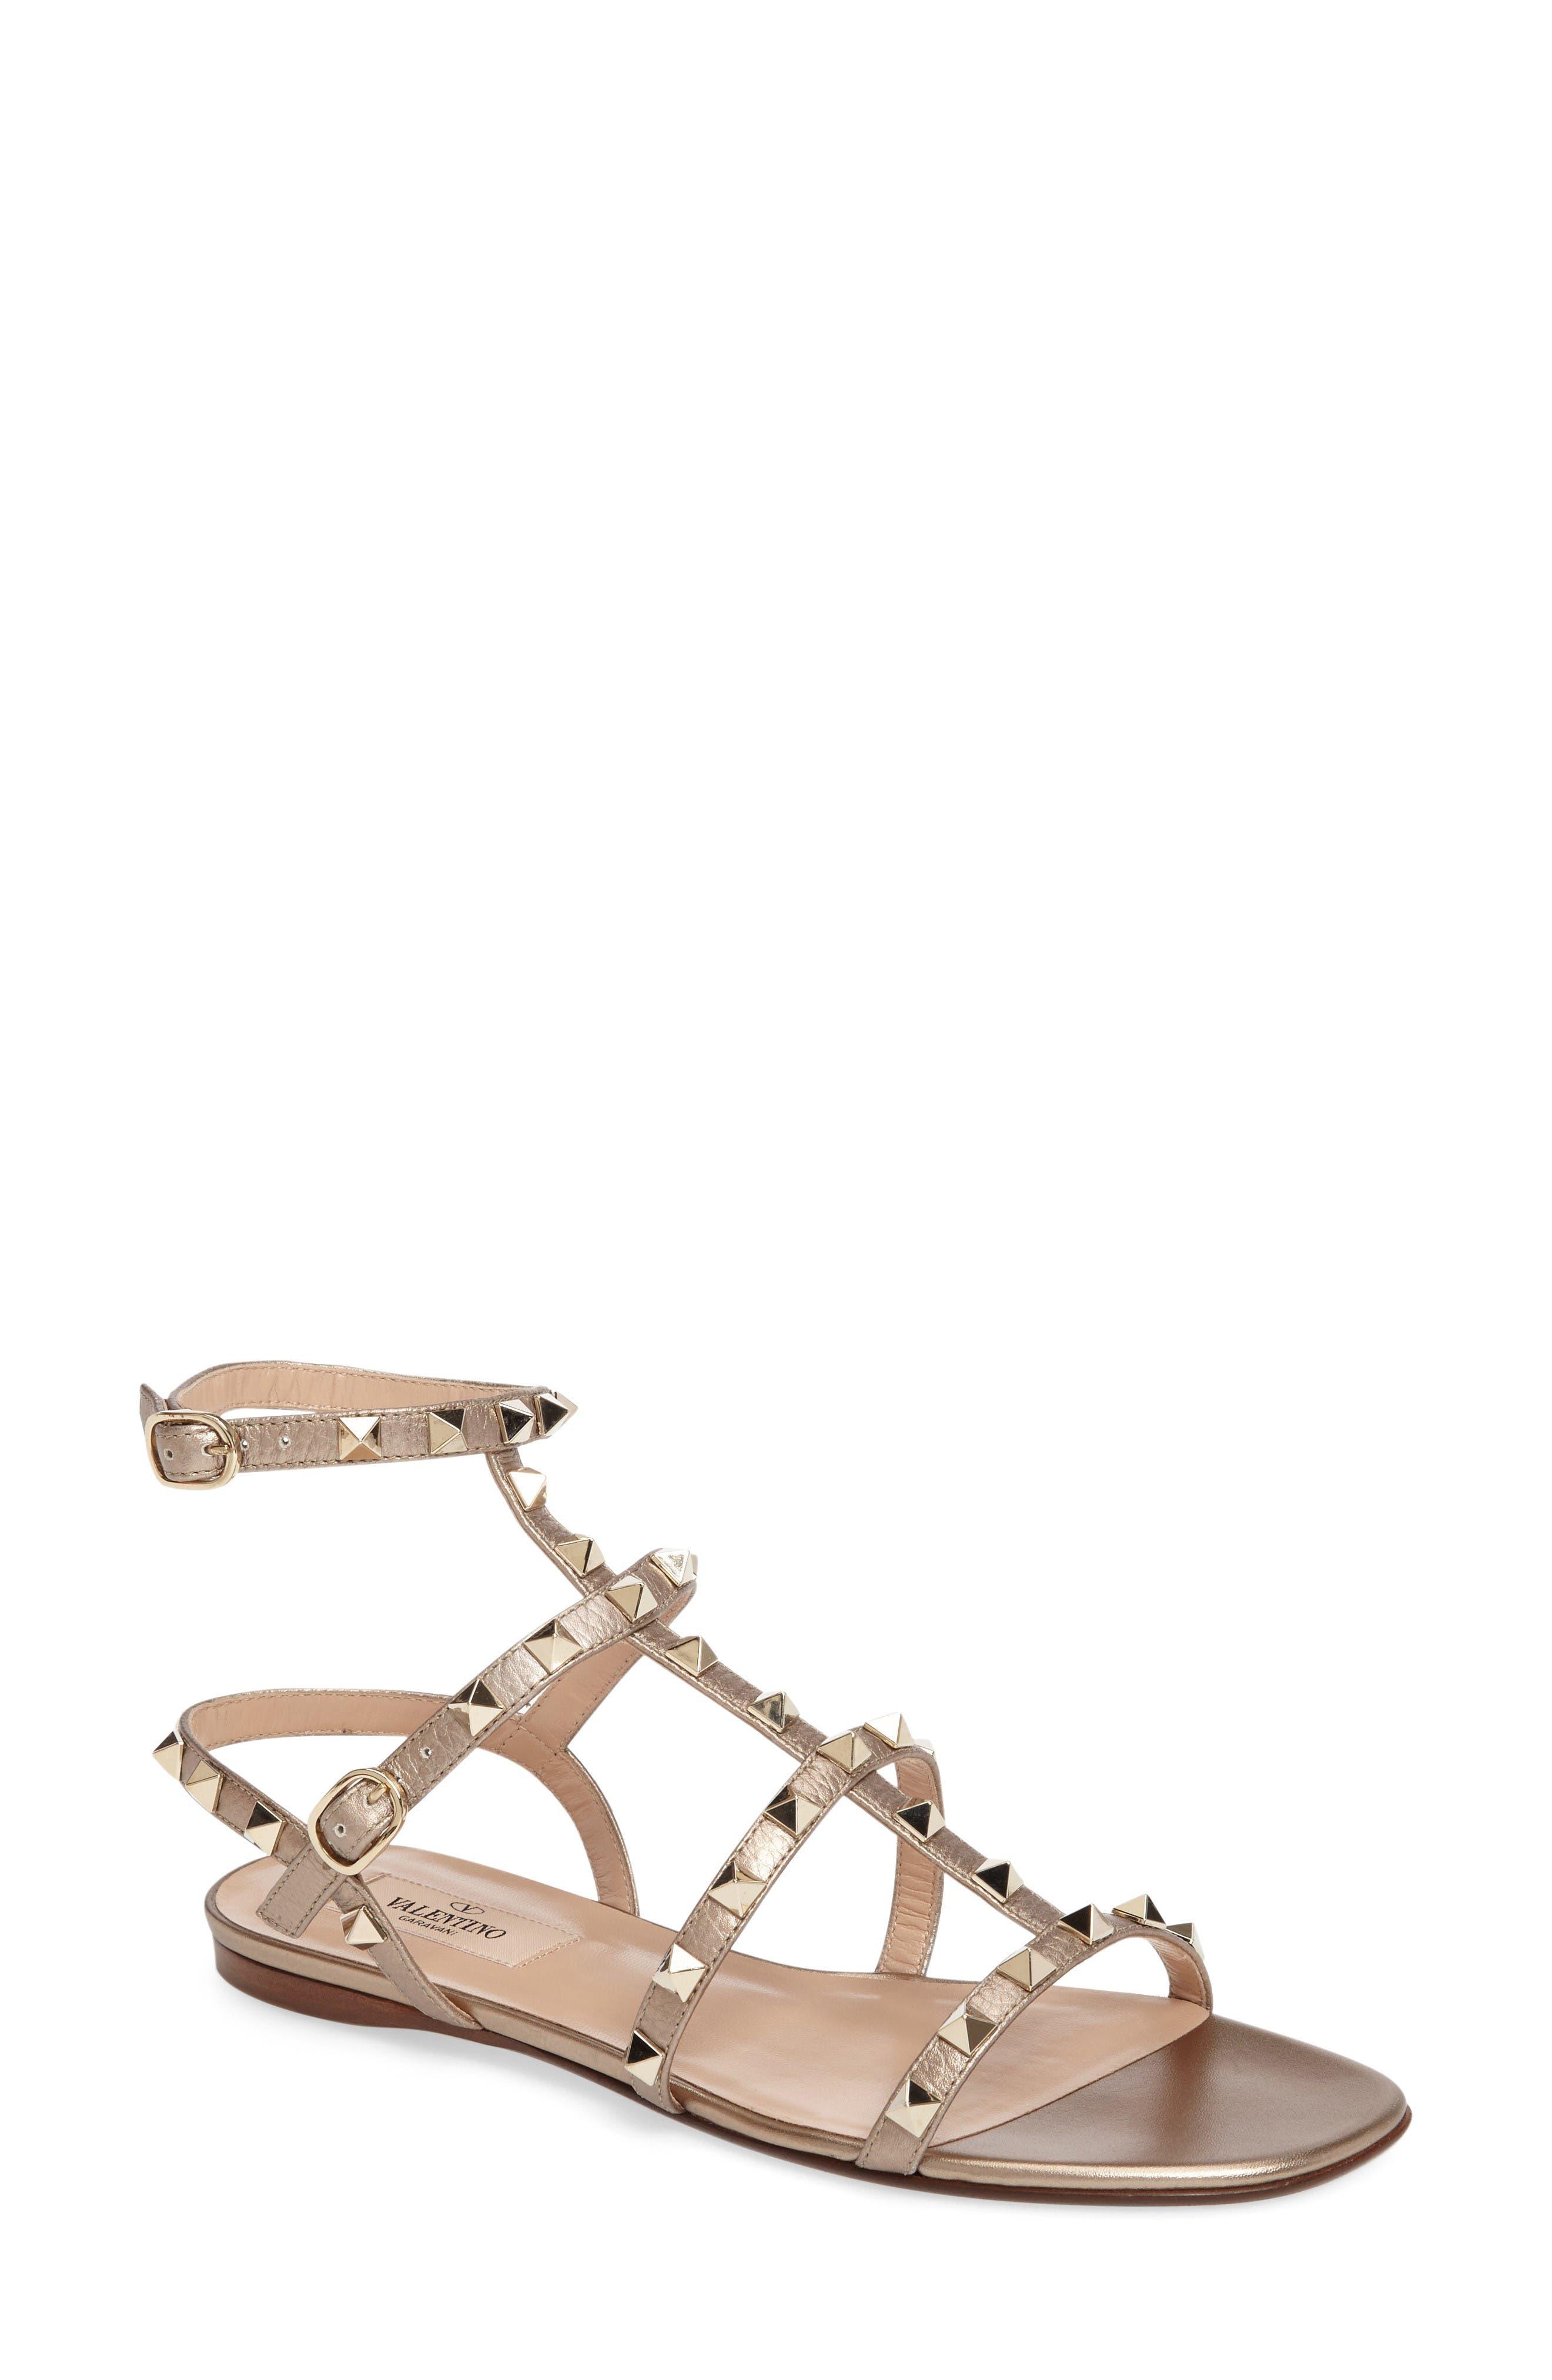 Alternate Image 1 Selected - VALENTINO GARAVANI 'Rockstud' Gladiator Sandal (Women)